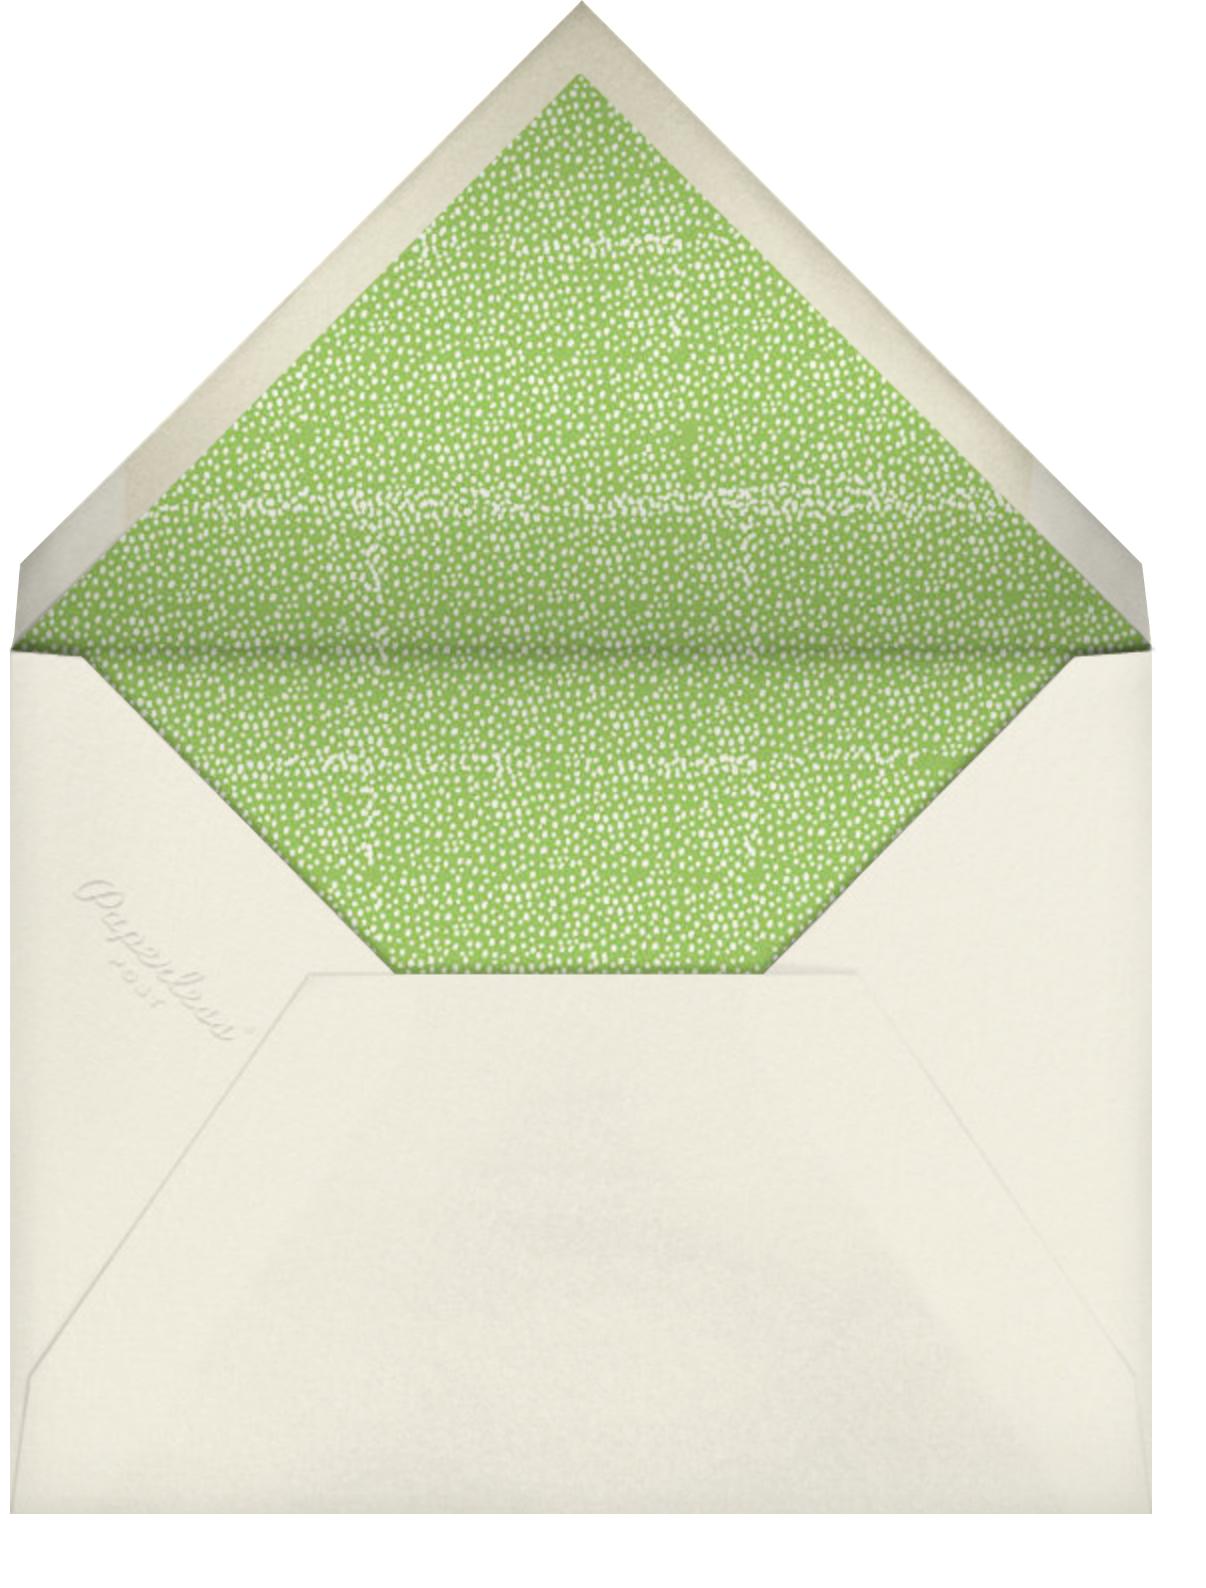 Nine Pies - Mr. Boddington's Studio - Thanksgiving - envelope back